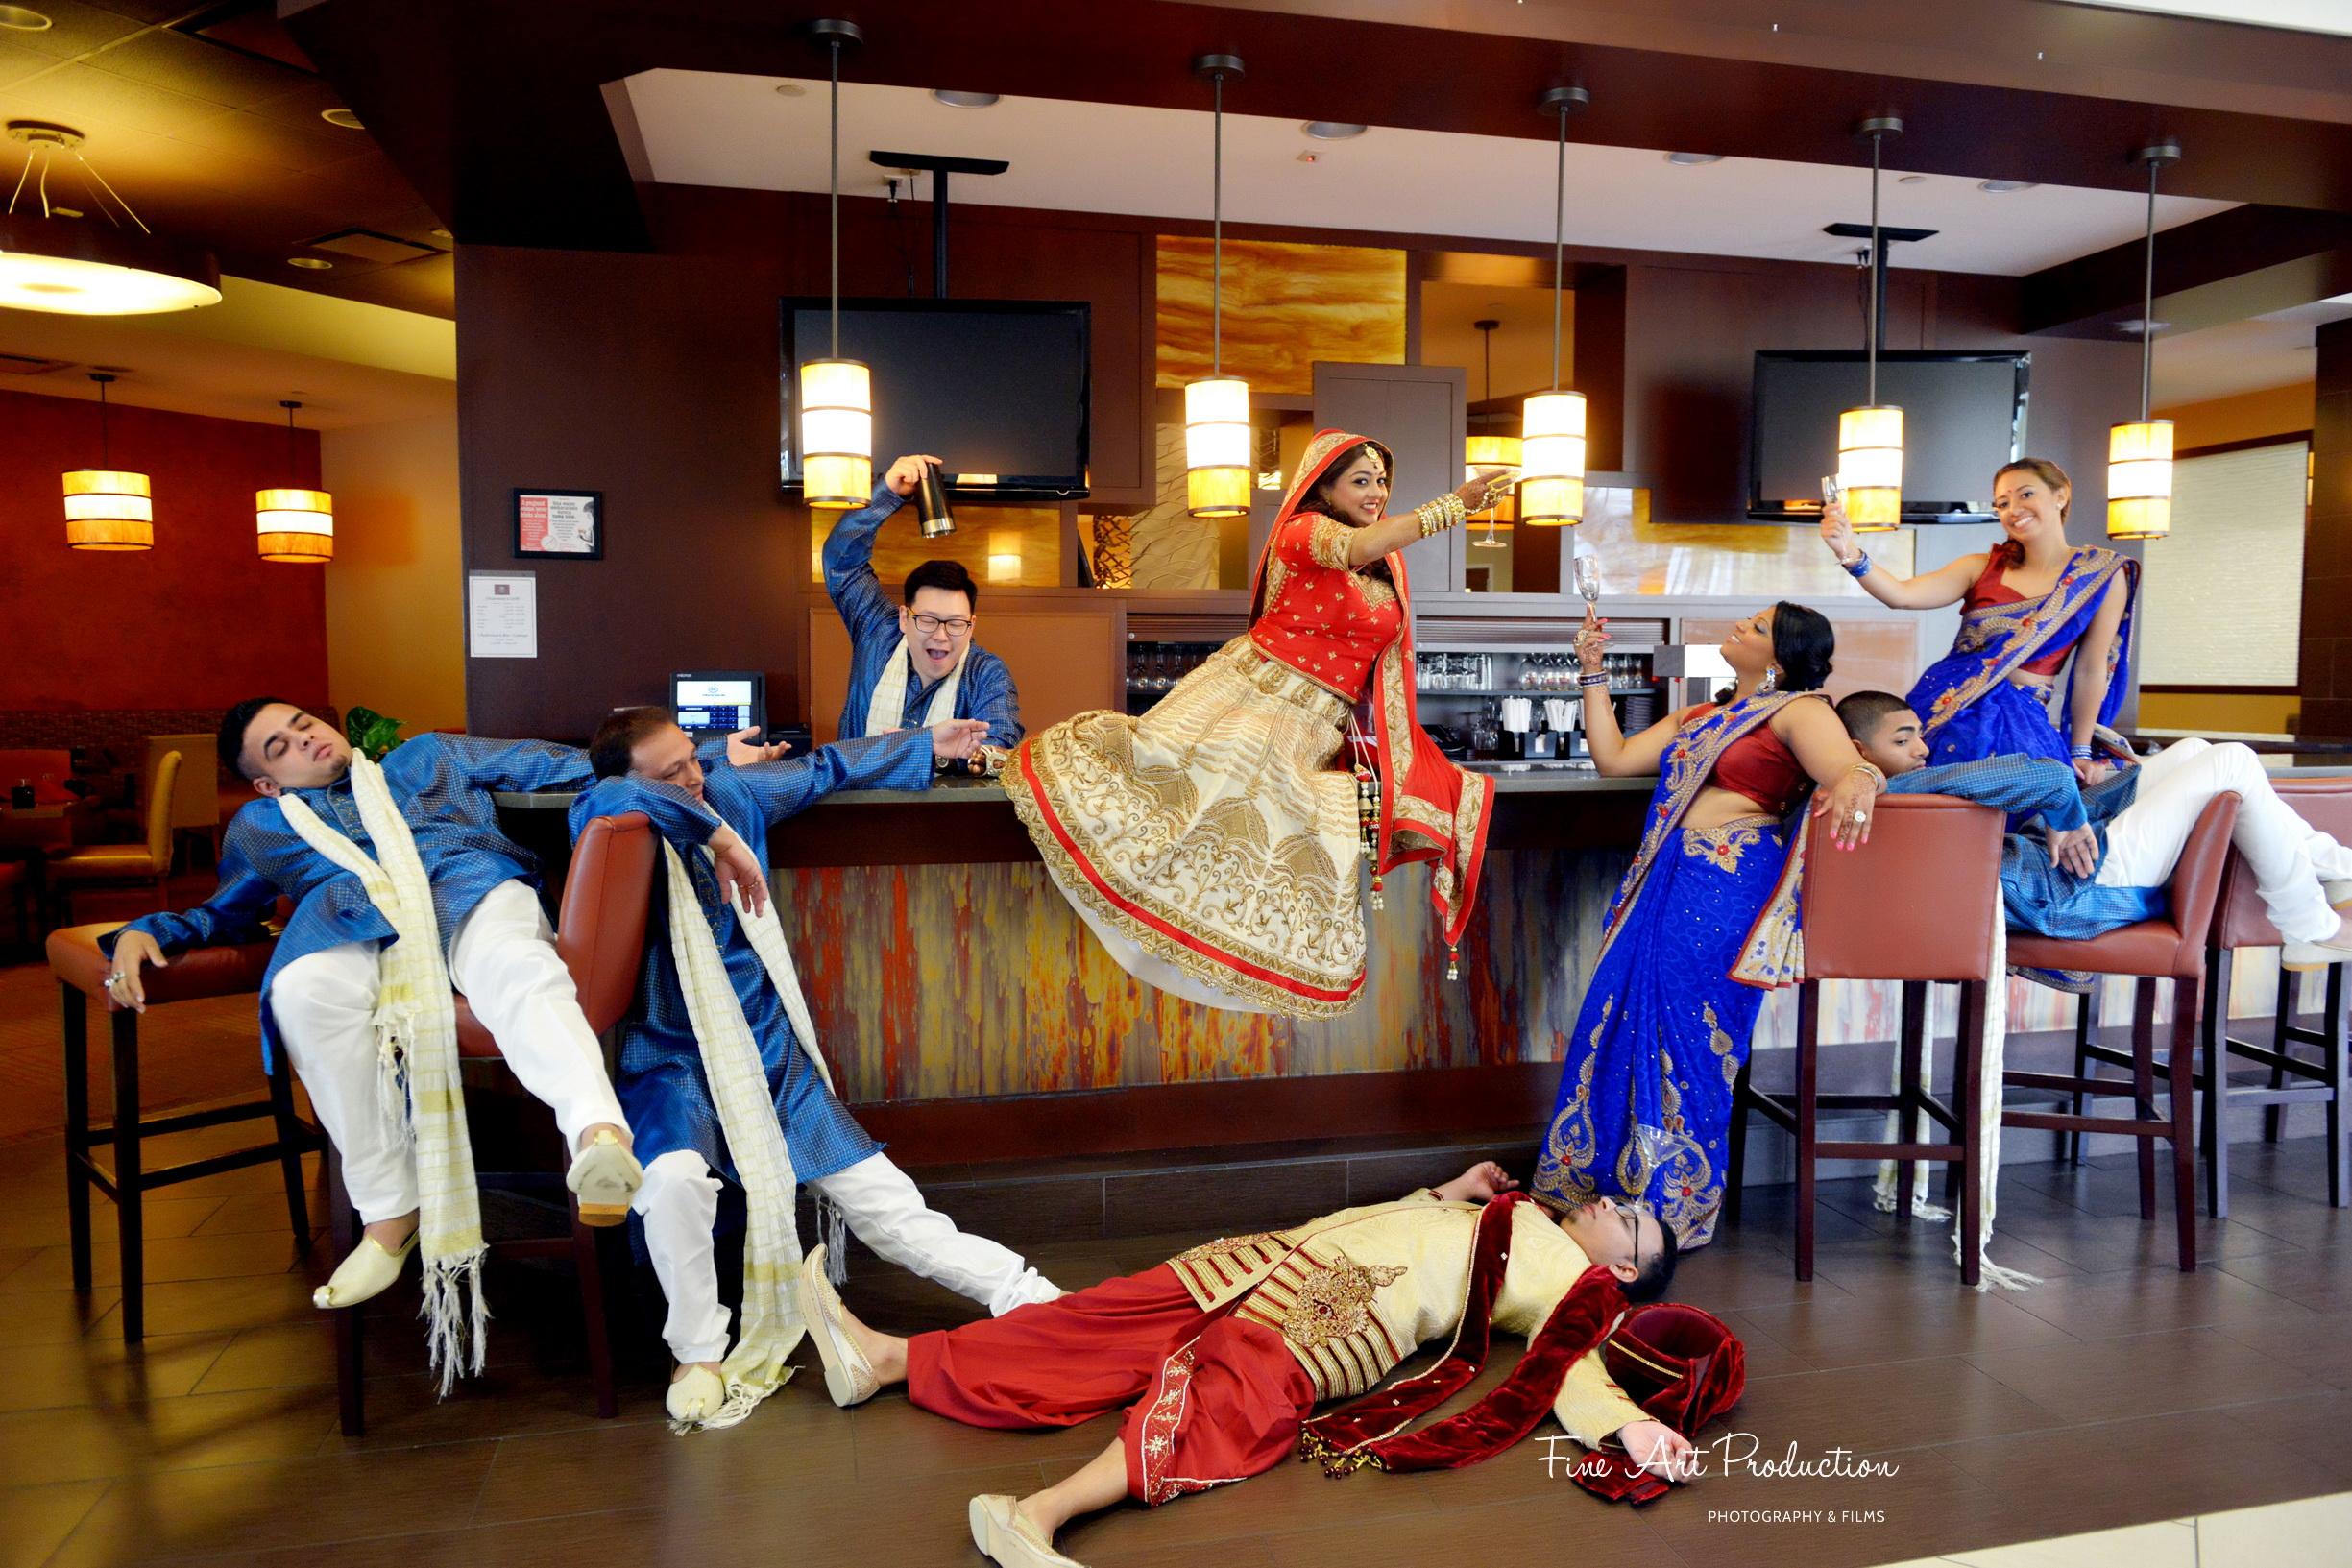 india-wedding-photographer-fine-art-production-chirali-amish-thakkar_0085